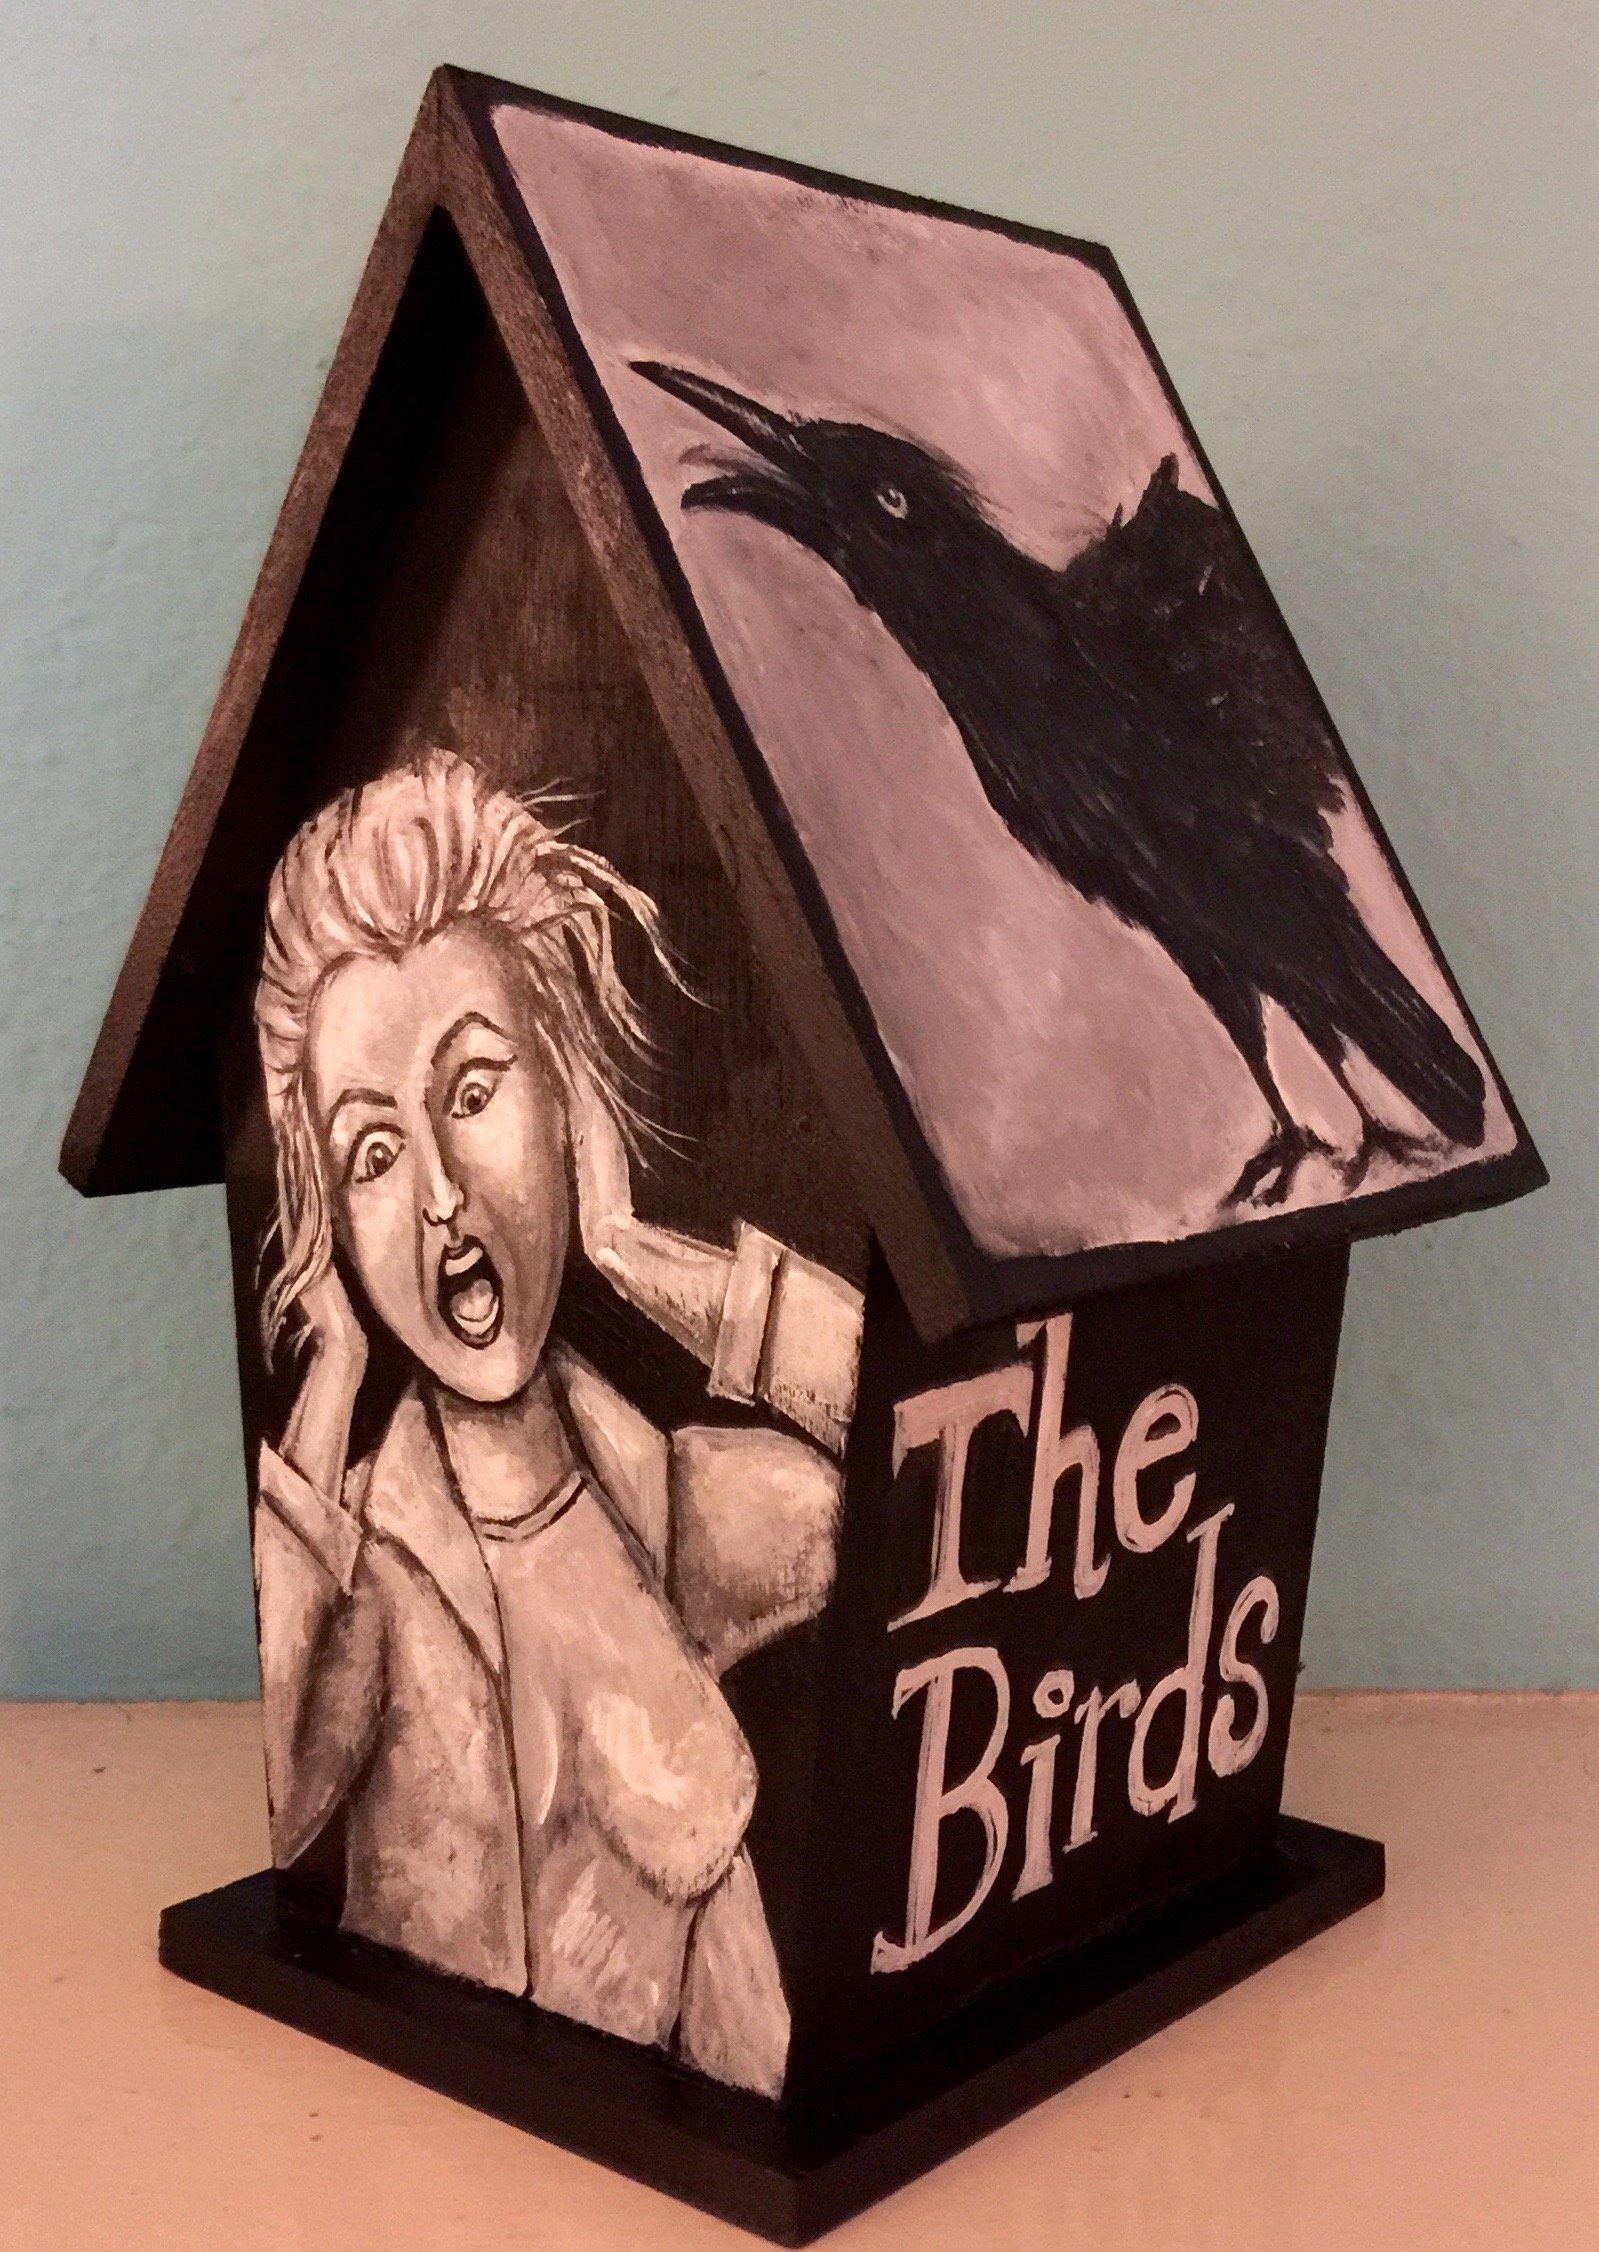 Decorative Alfred Hitchcock The Birds Horror Movie Birdhouse